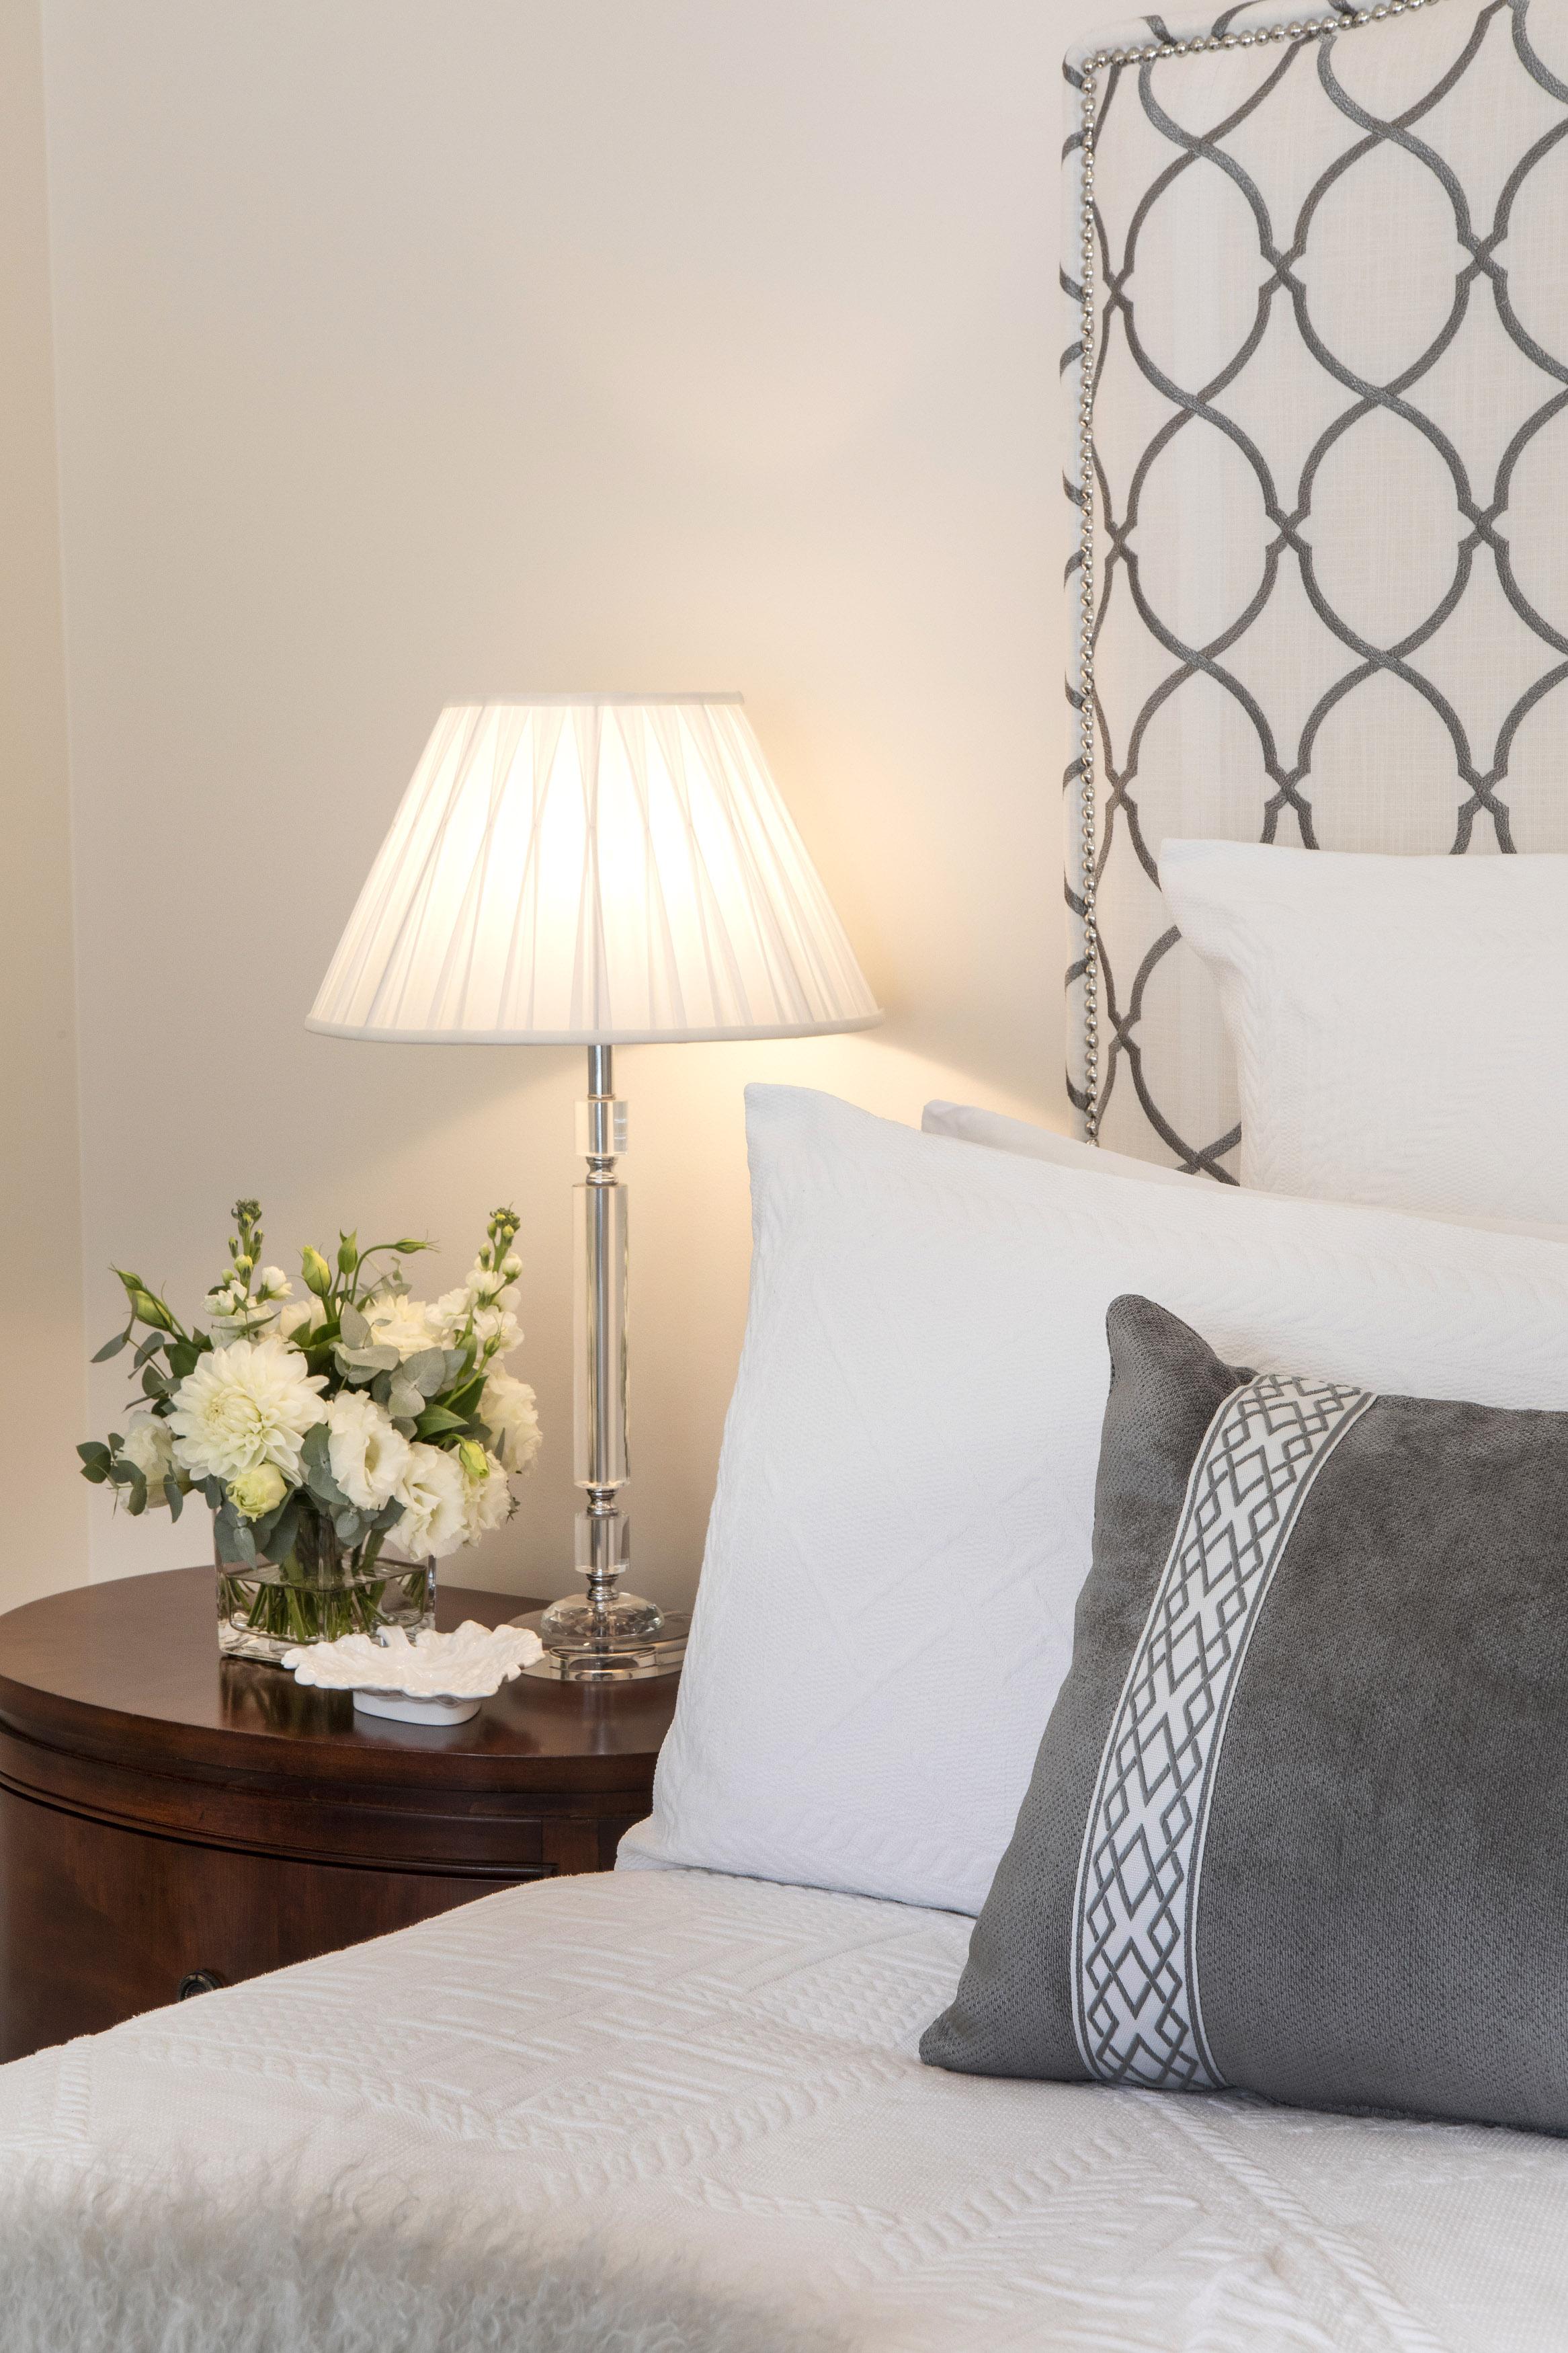 Carrie Deverson Interiors_ Bedroom Detail.jpg